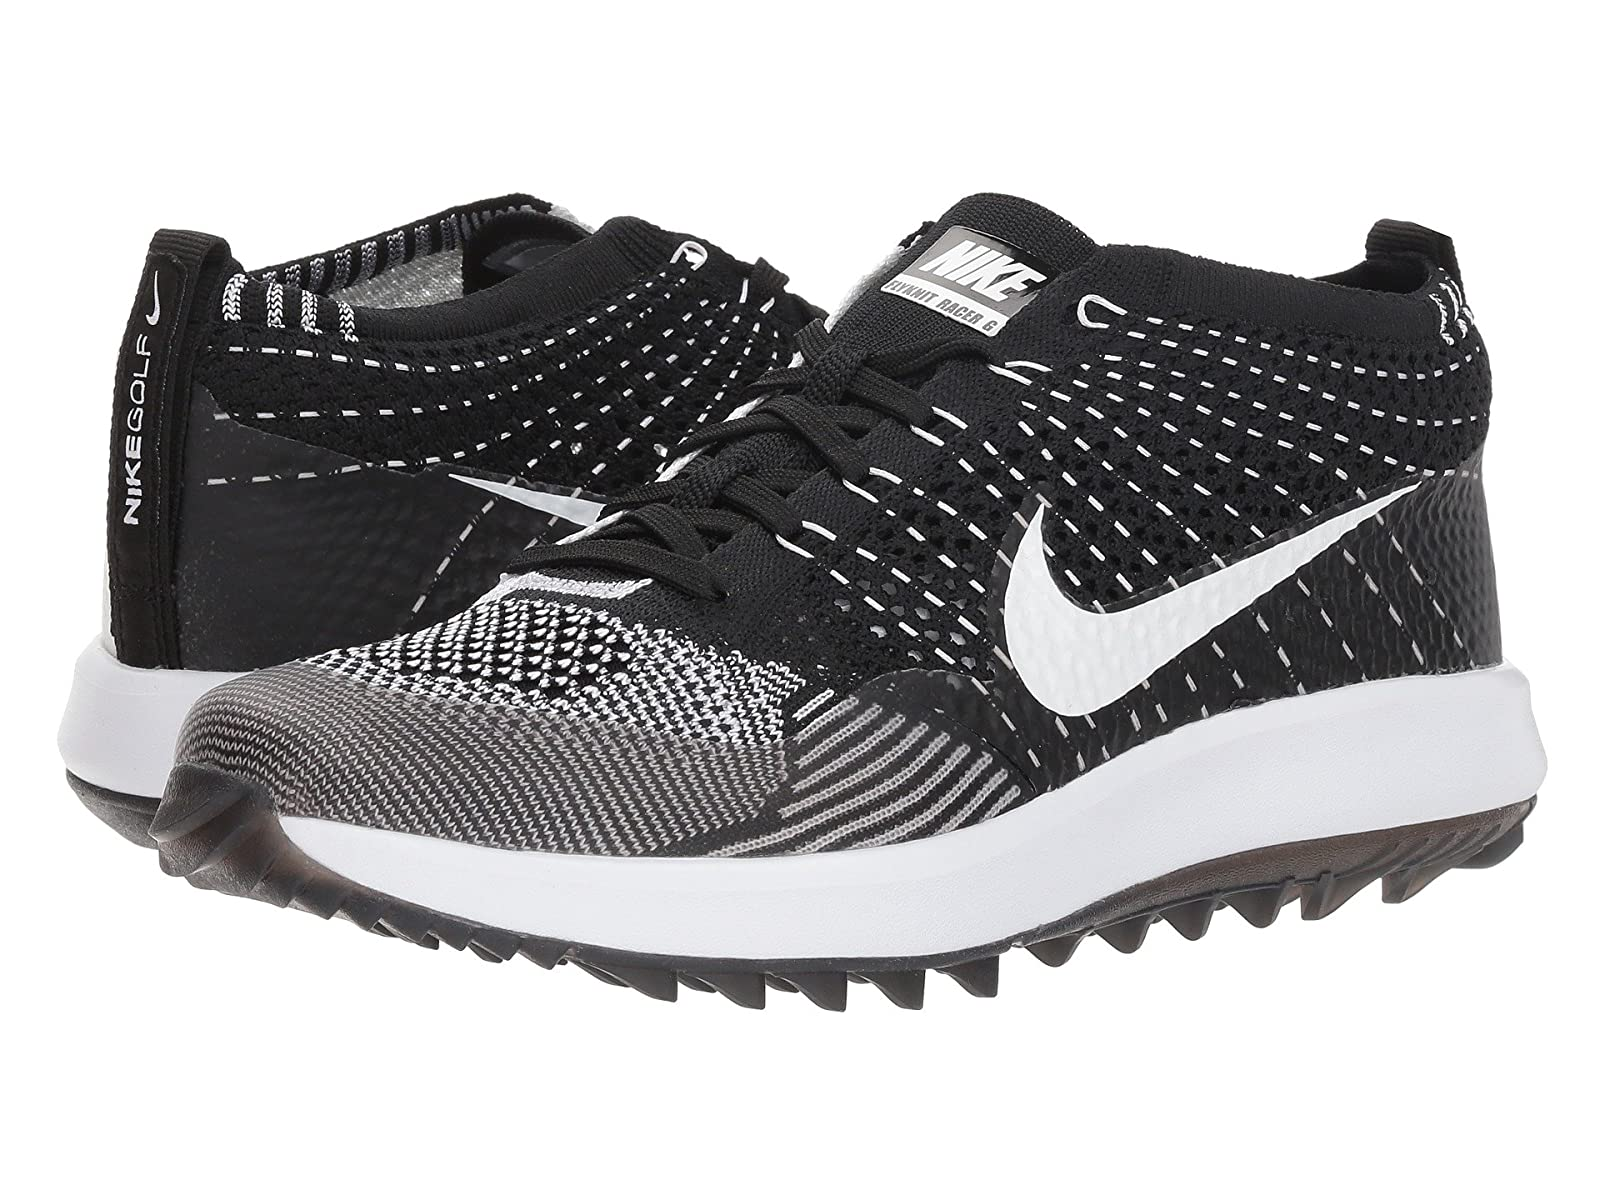 Nike Golf Flyknit Racer GAtmospheric grades have affordable shoes